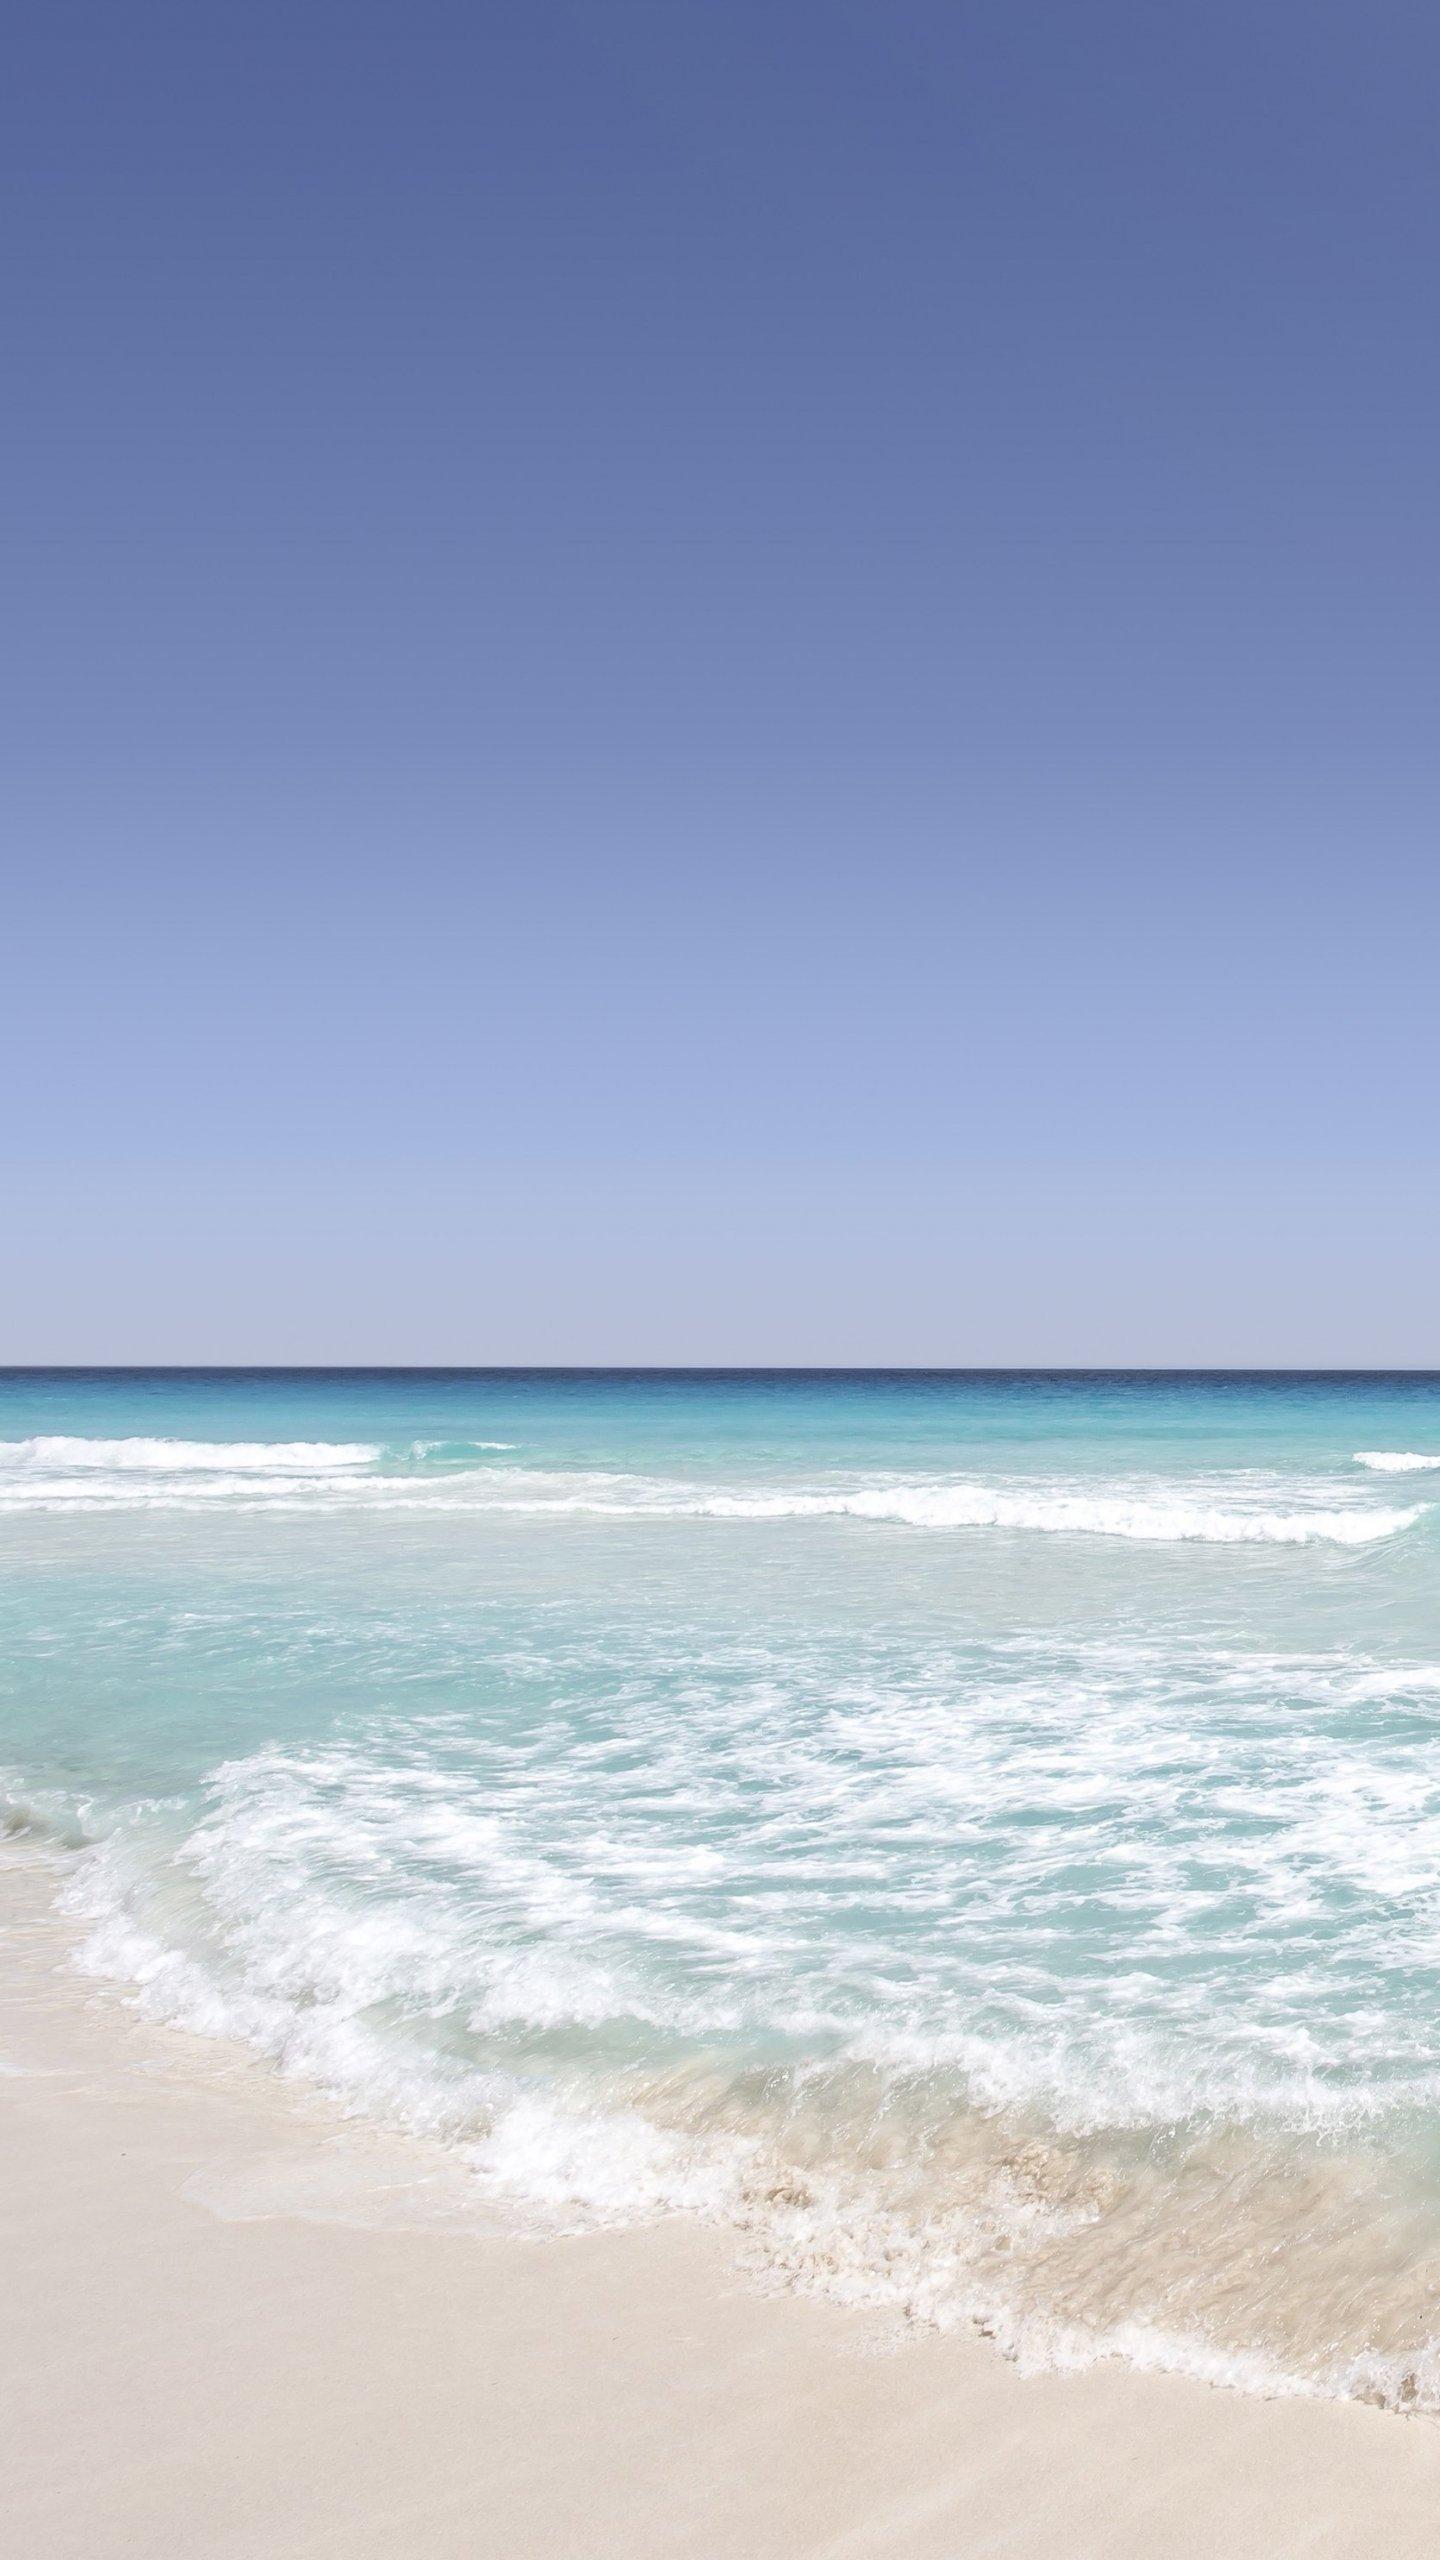 tropical sandy beach wallpaper